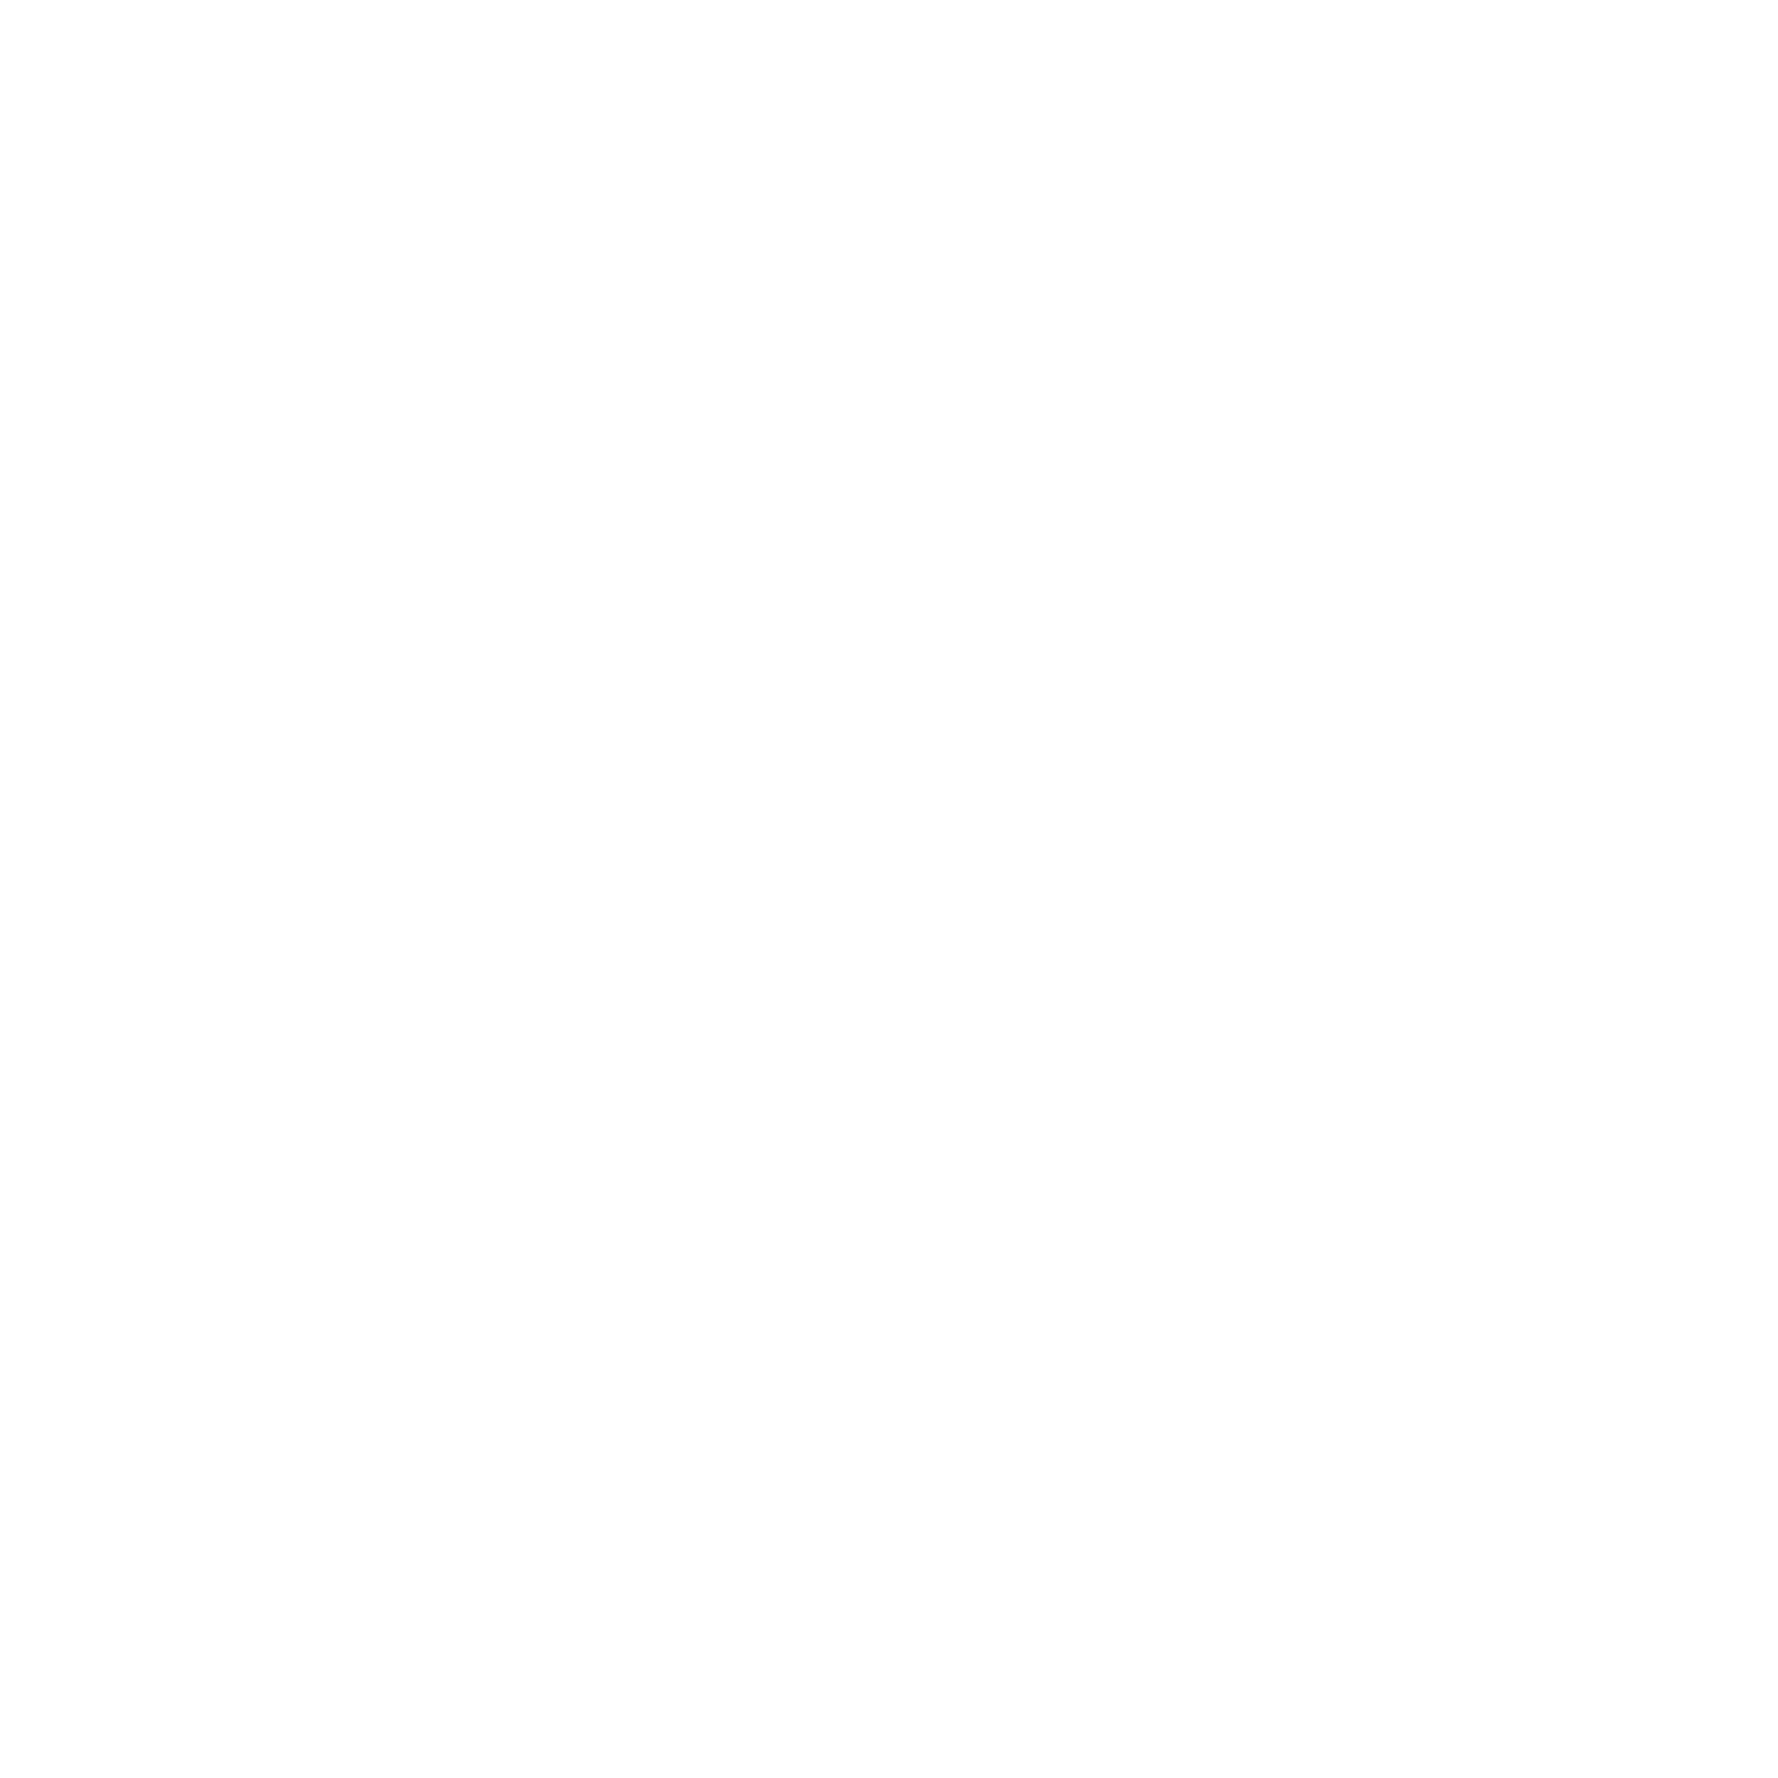 edmill-miniature-logo